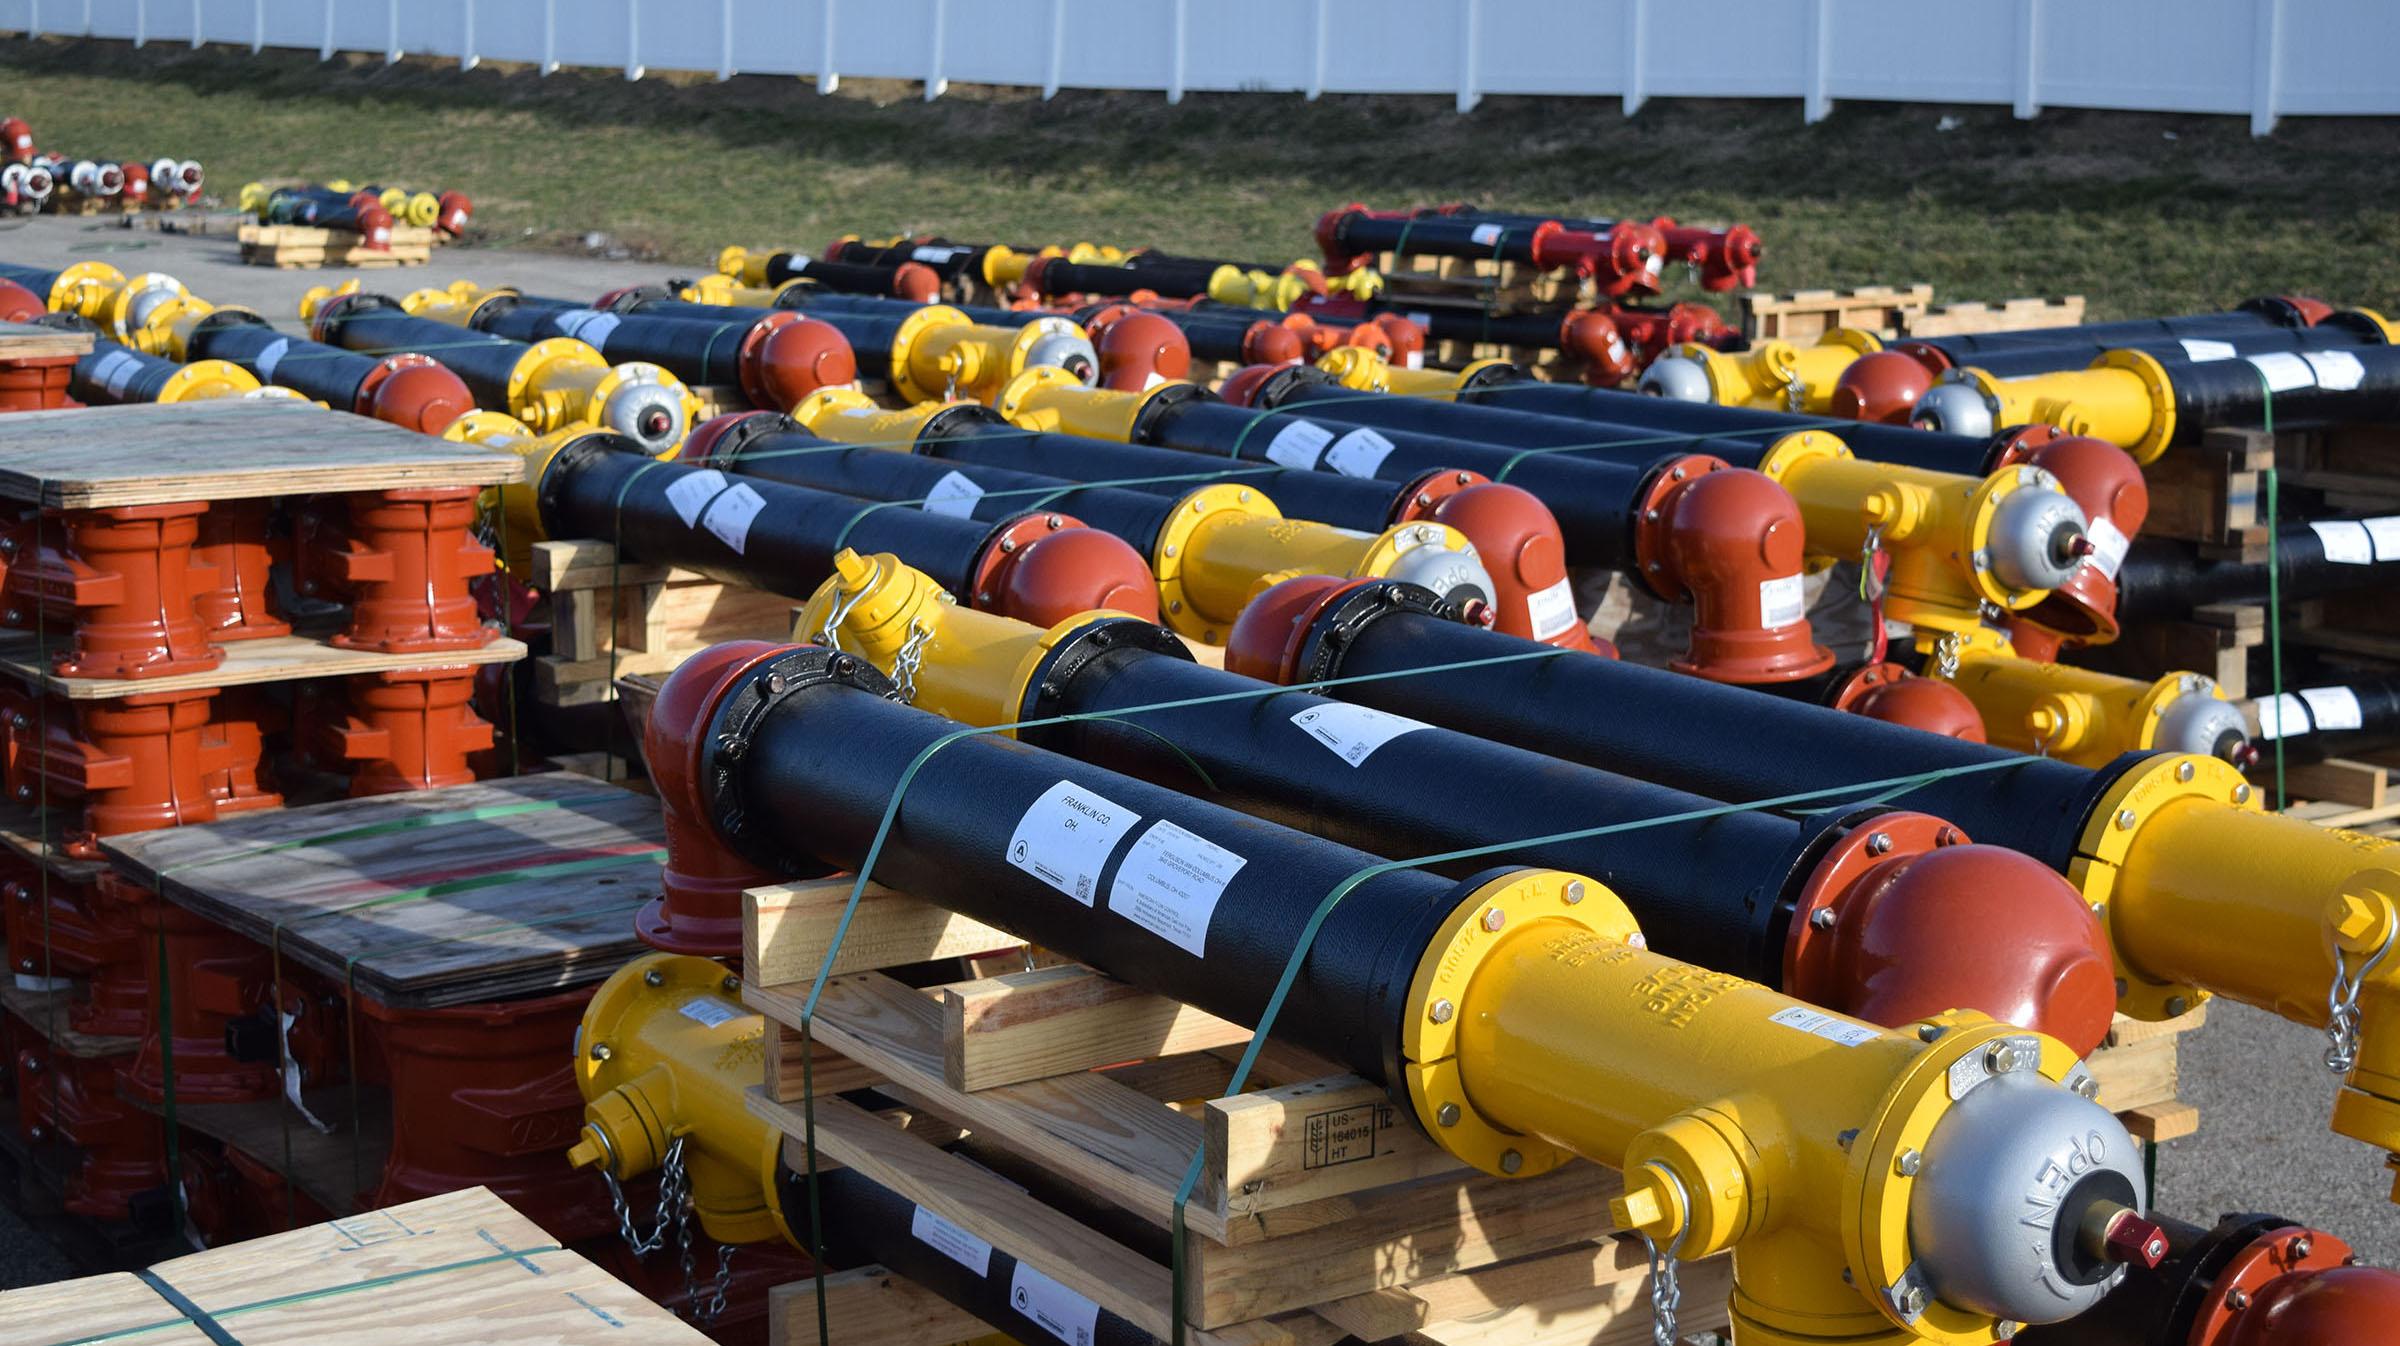 AMERICAN Flow Control, American-Darling MK 73 fire hydrants, resilient wedge gate valves, Elite Excavating